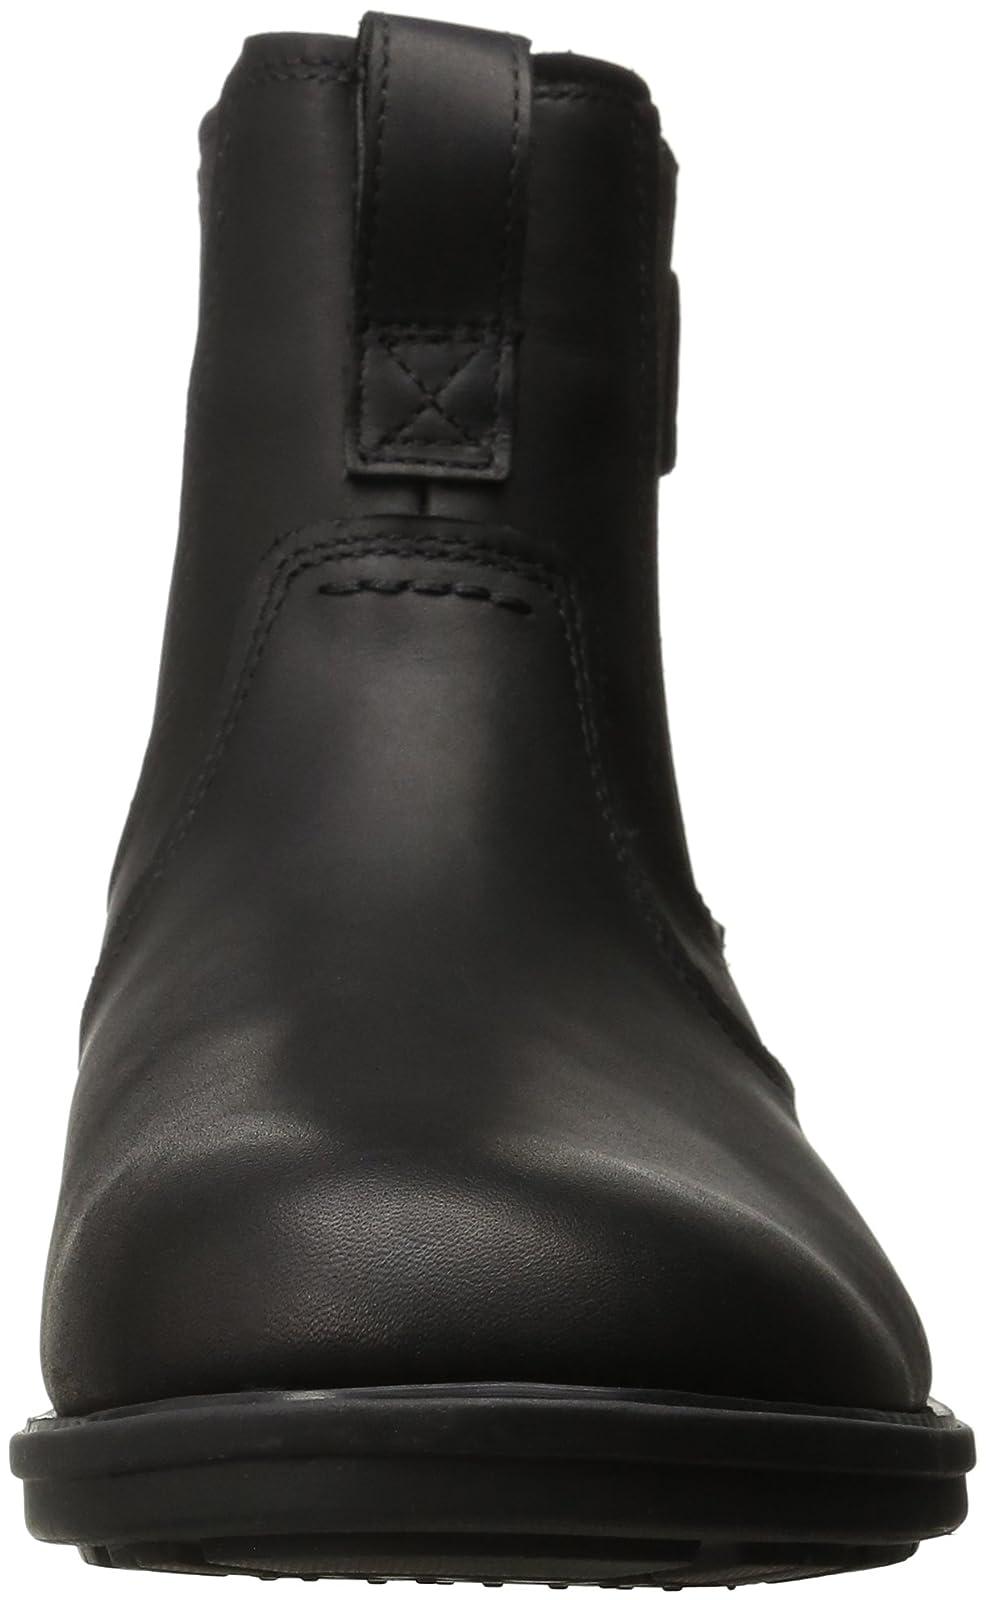 Timberland Men's Carter Notch PT Chelsea Boot 8 M US - 4